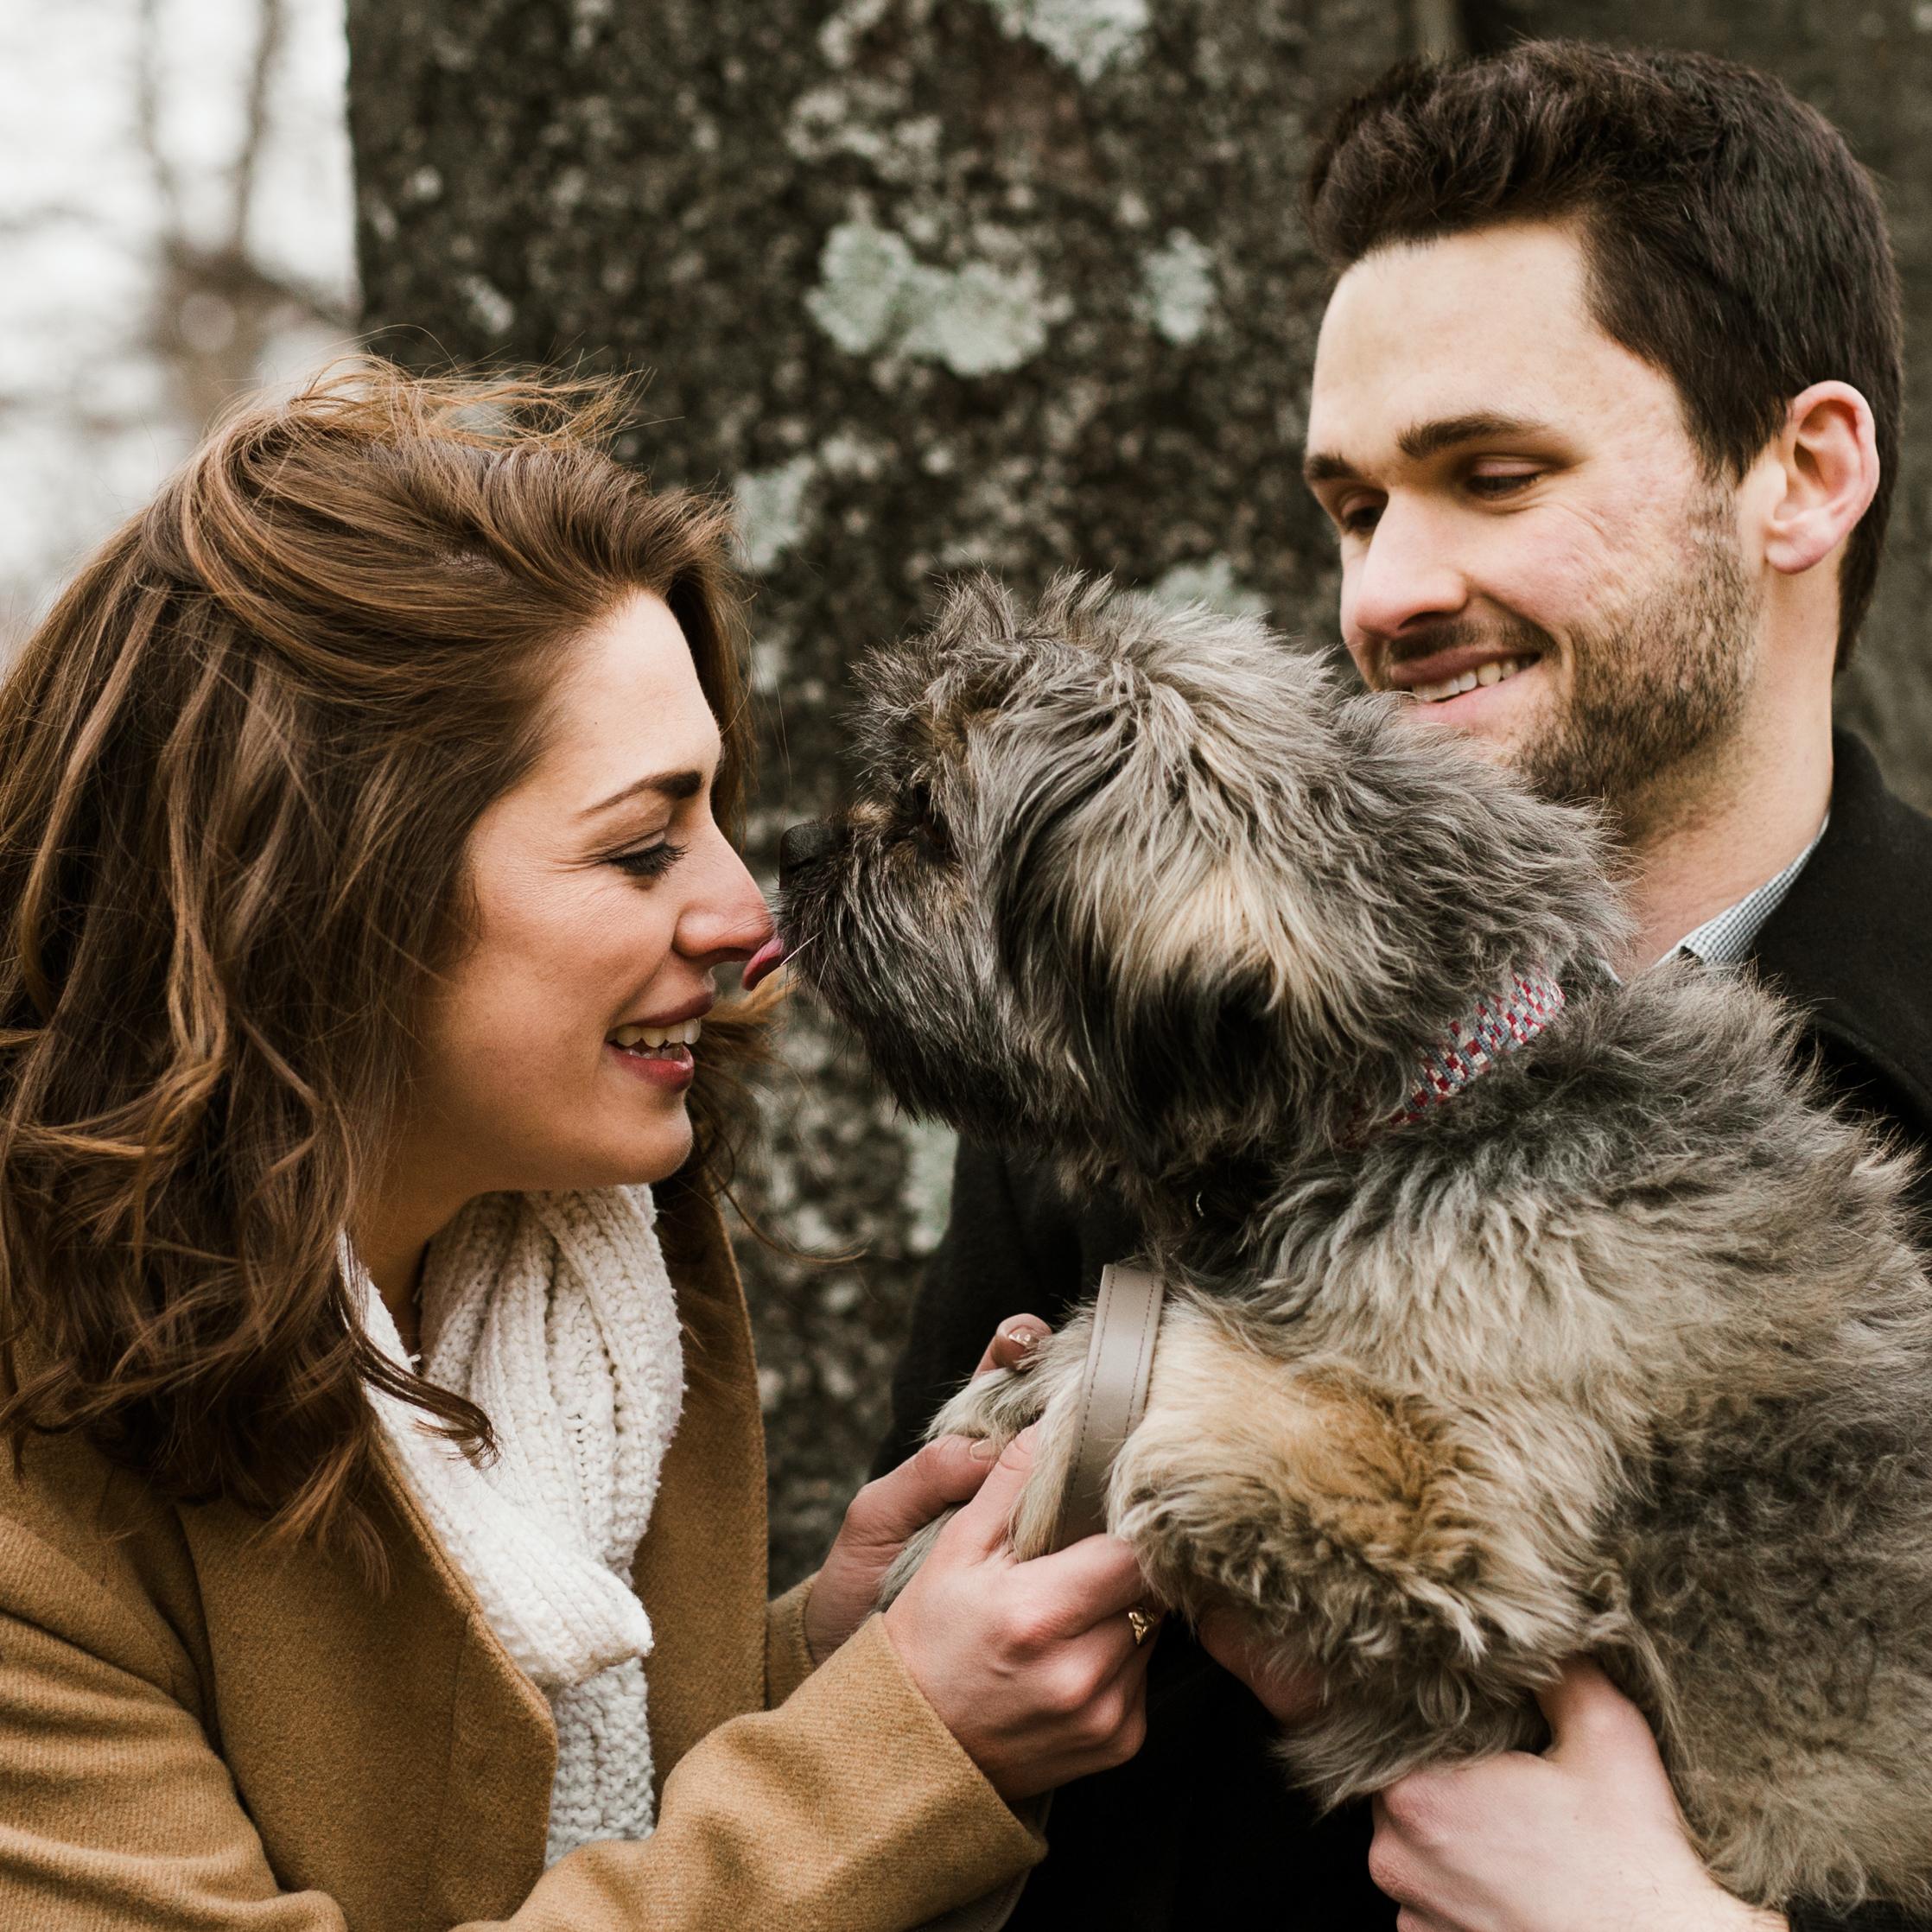 Ellen & Lee Engagement 2018 WEBSITE SP Crystal Ludwick Photo (26 of 54).jpg